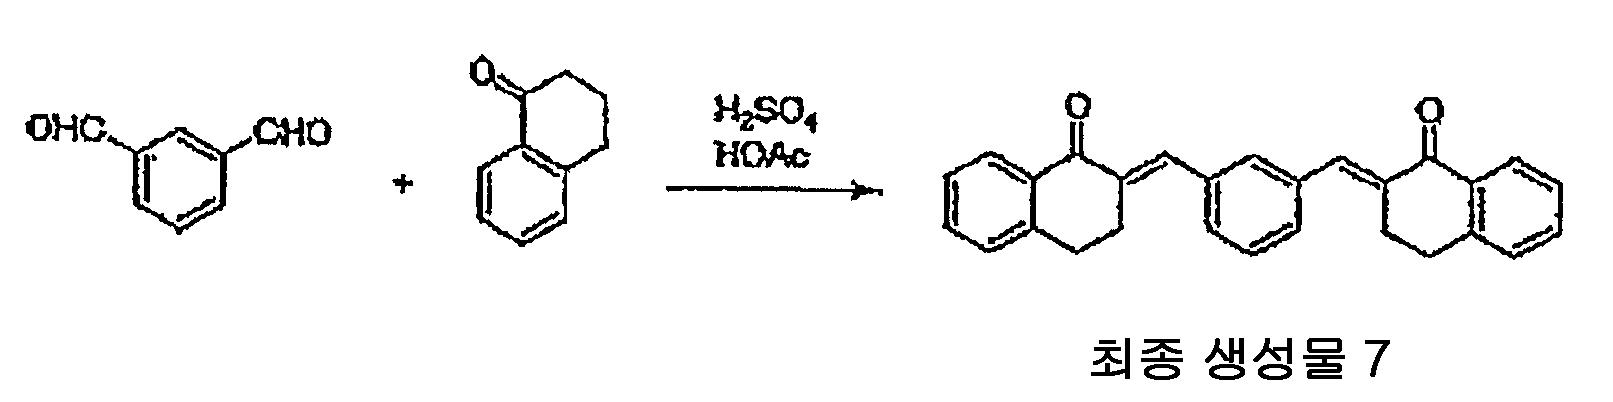 Figure 112010002231902-pat00102